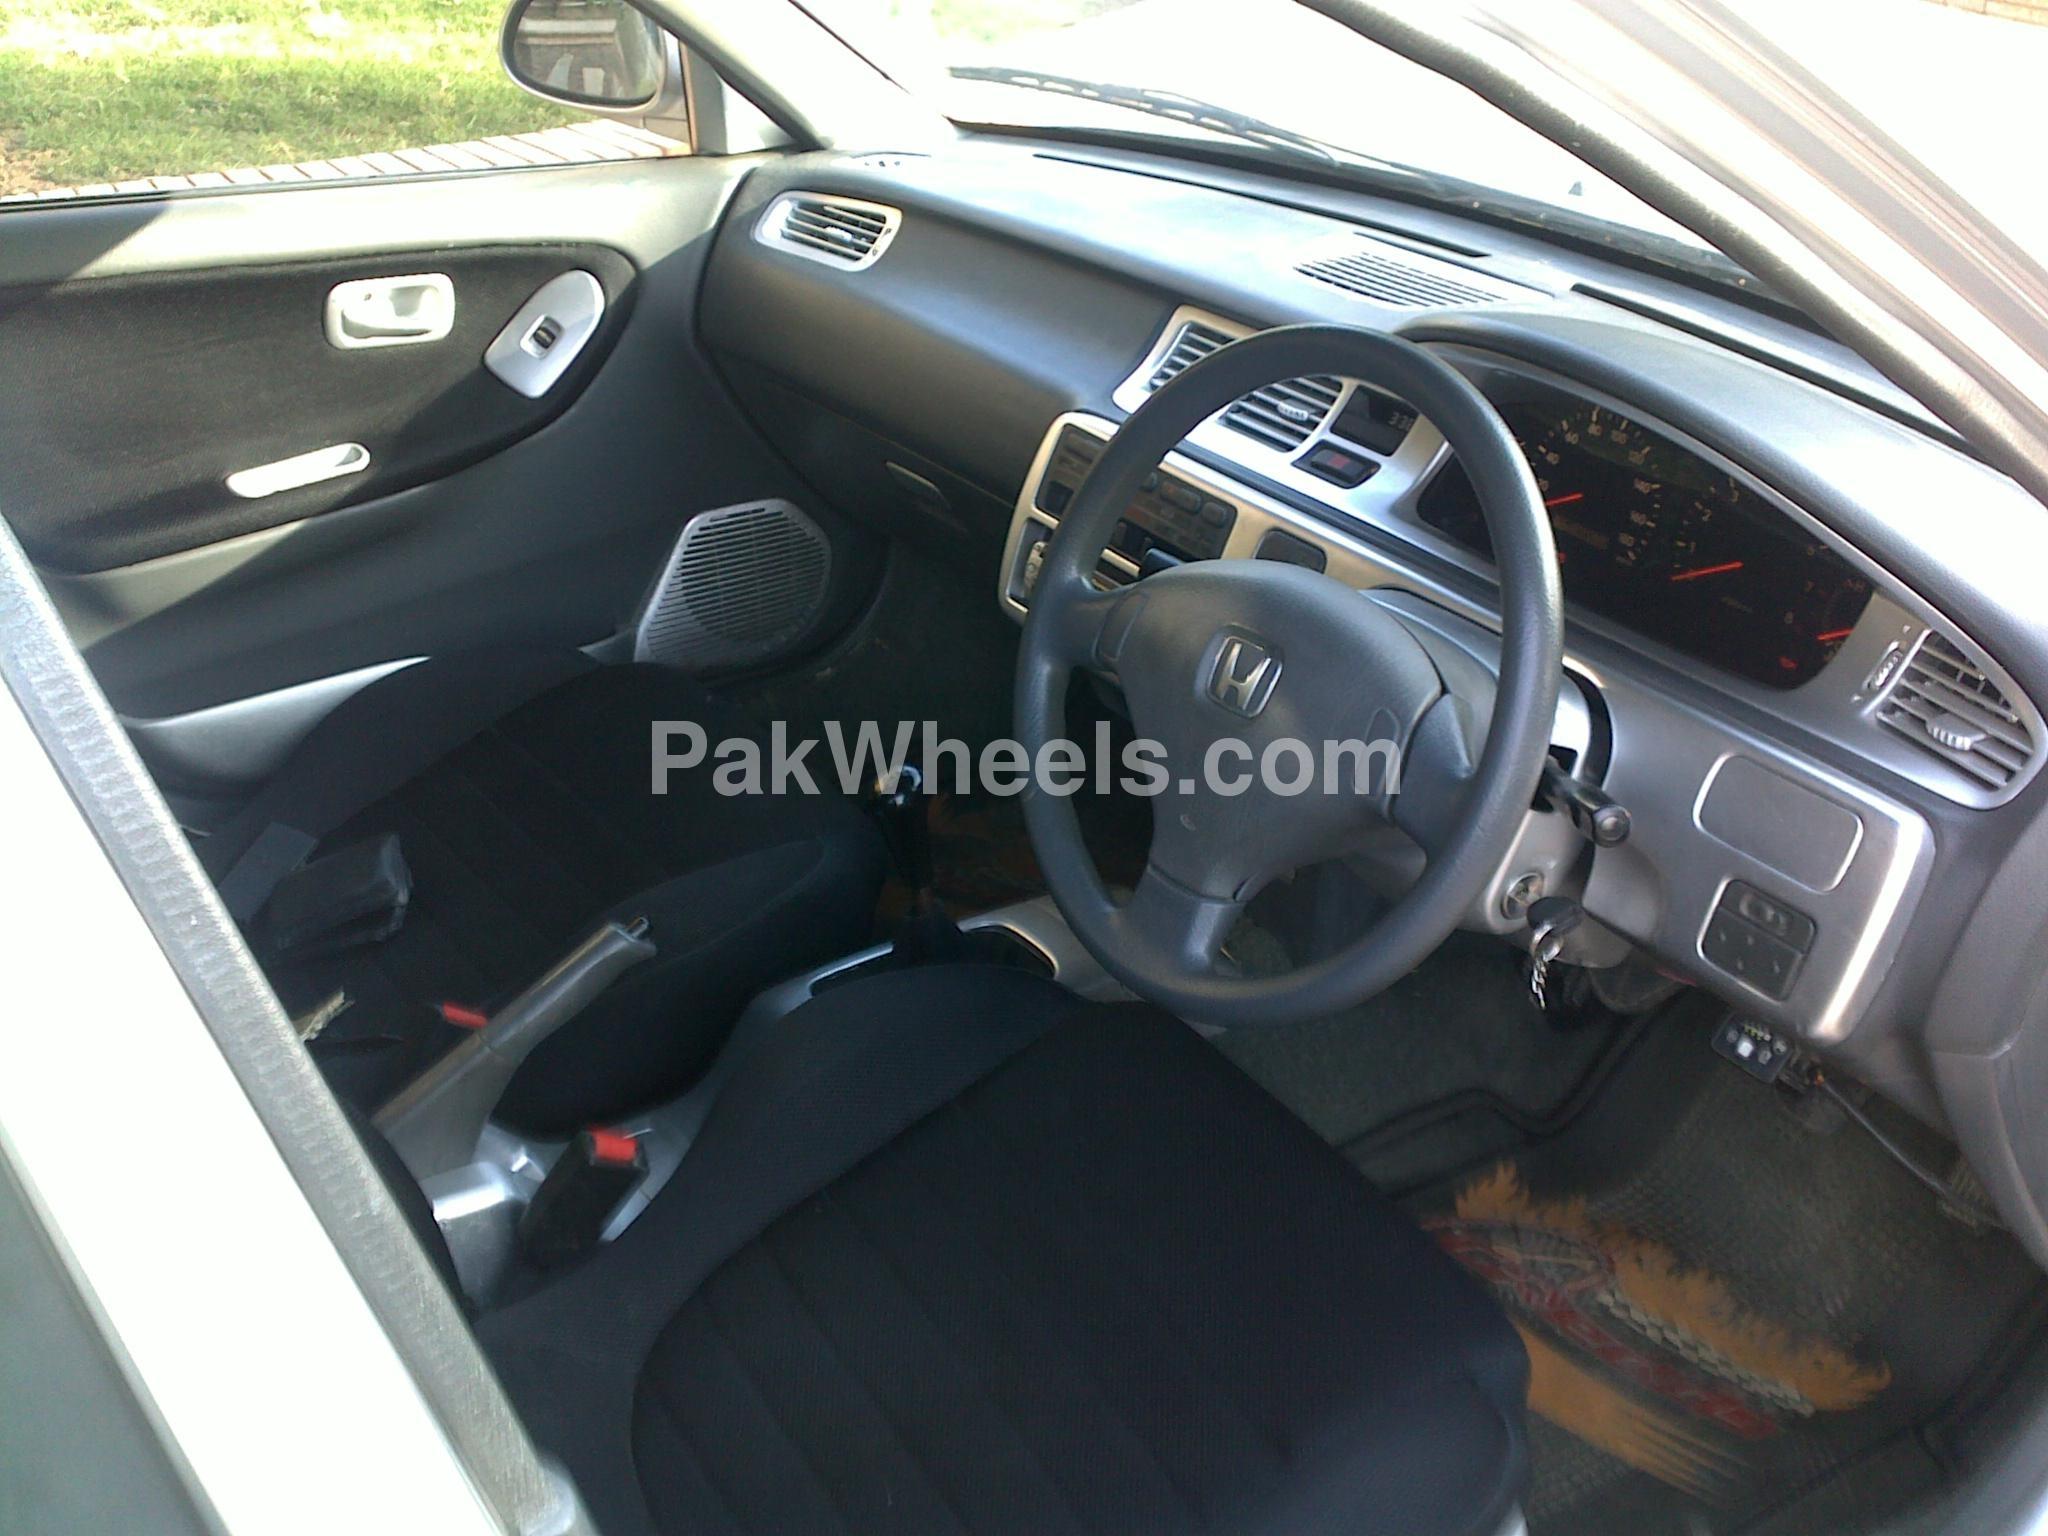 Honda civic 1995 of mudasr1 member ride 14435 pakwheels for 1995 honda civic interior parts